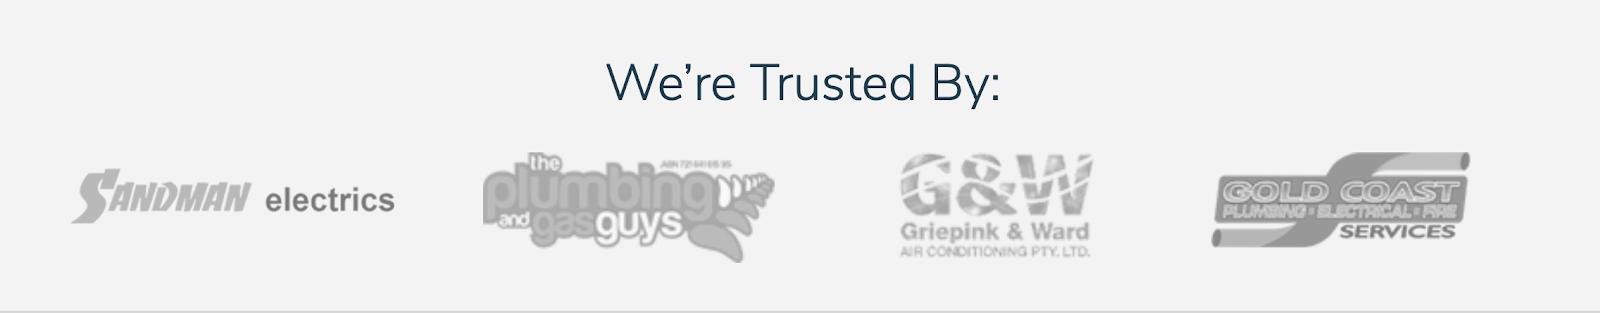 Content refresh tactic of adding trust builders